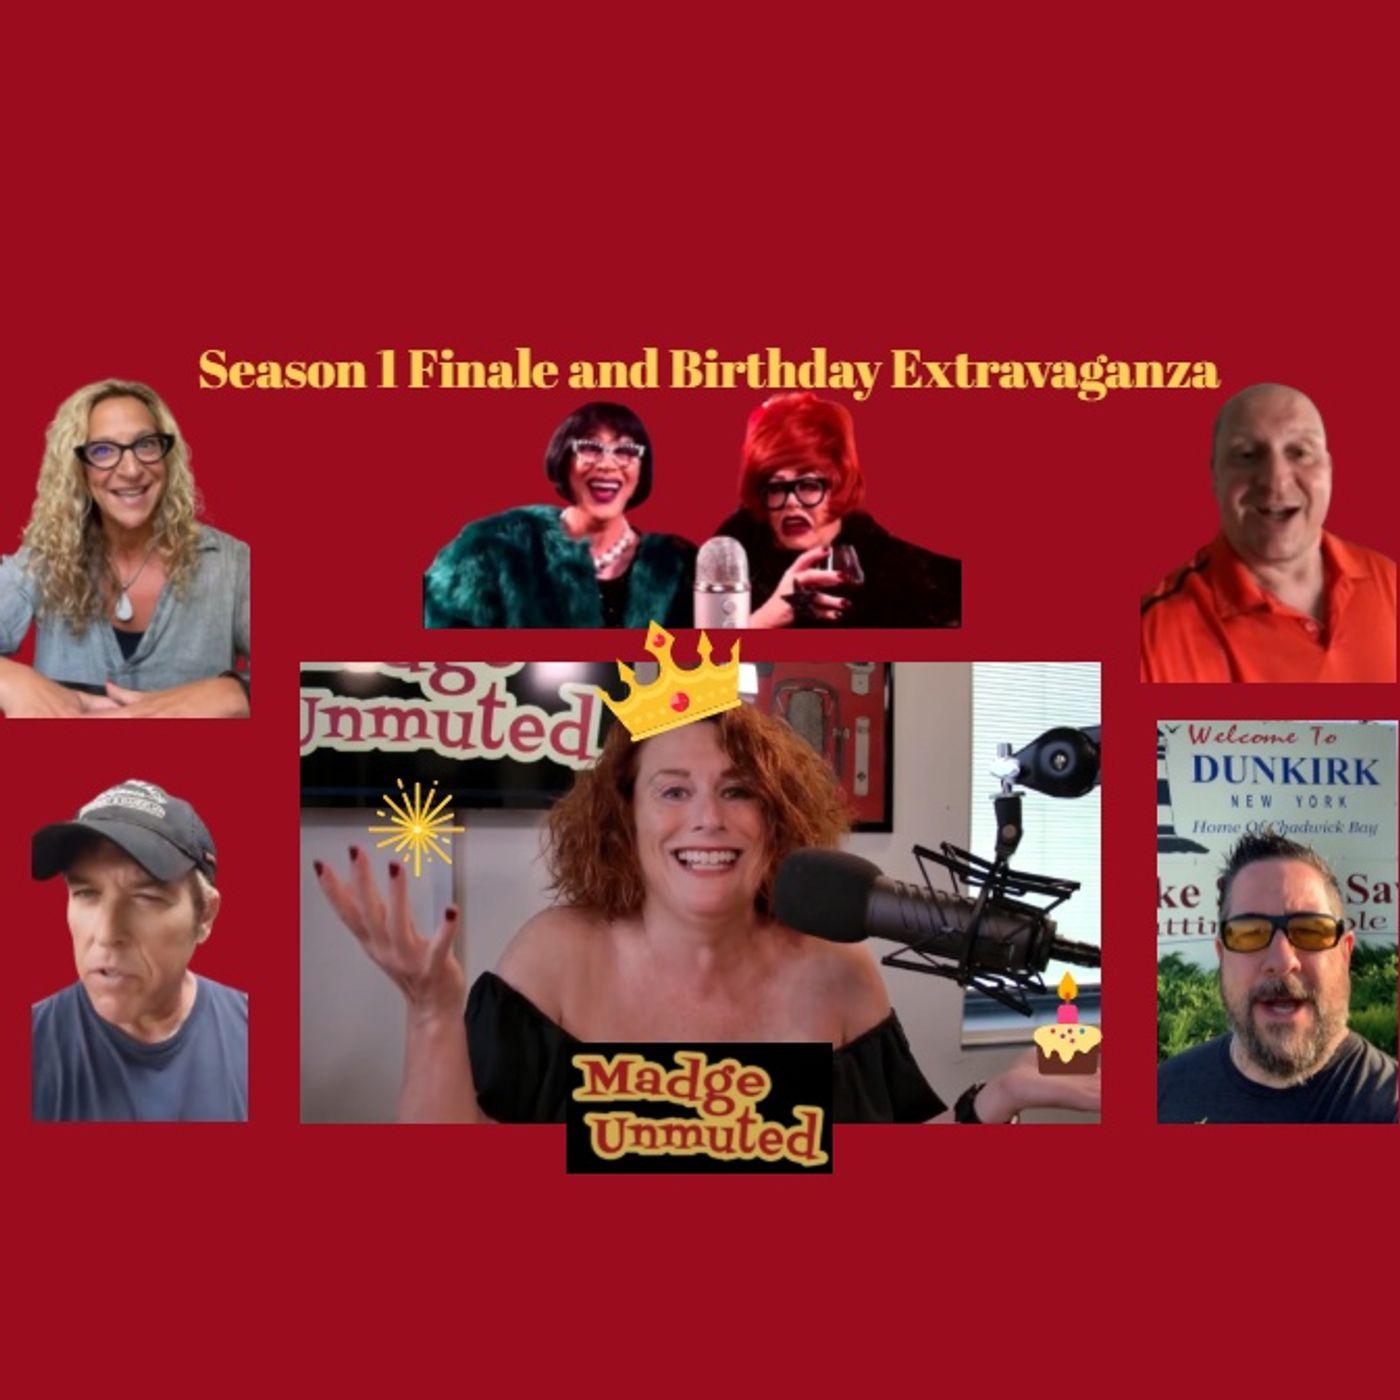 Cavalcade of Stars Season 1 Finale and Birthday Extravaganza